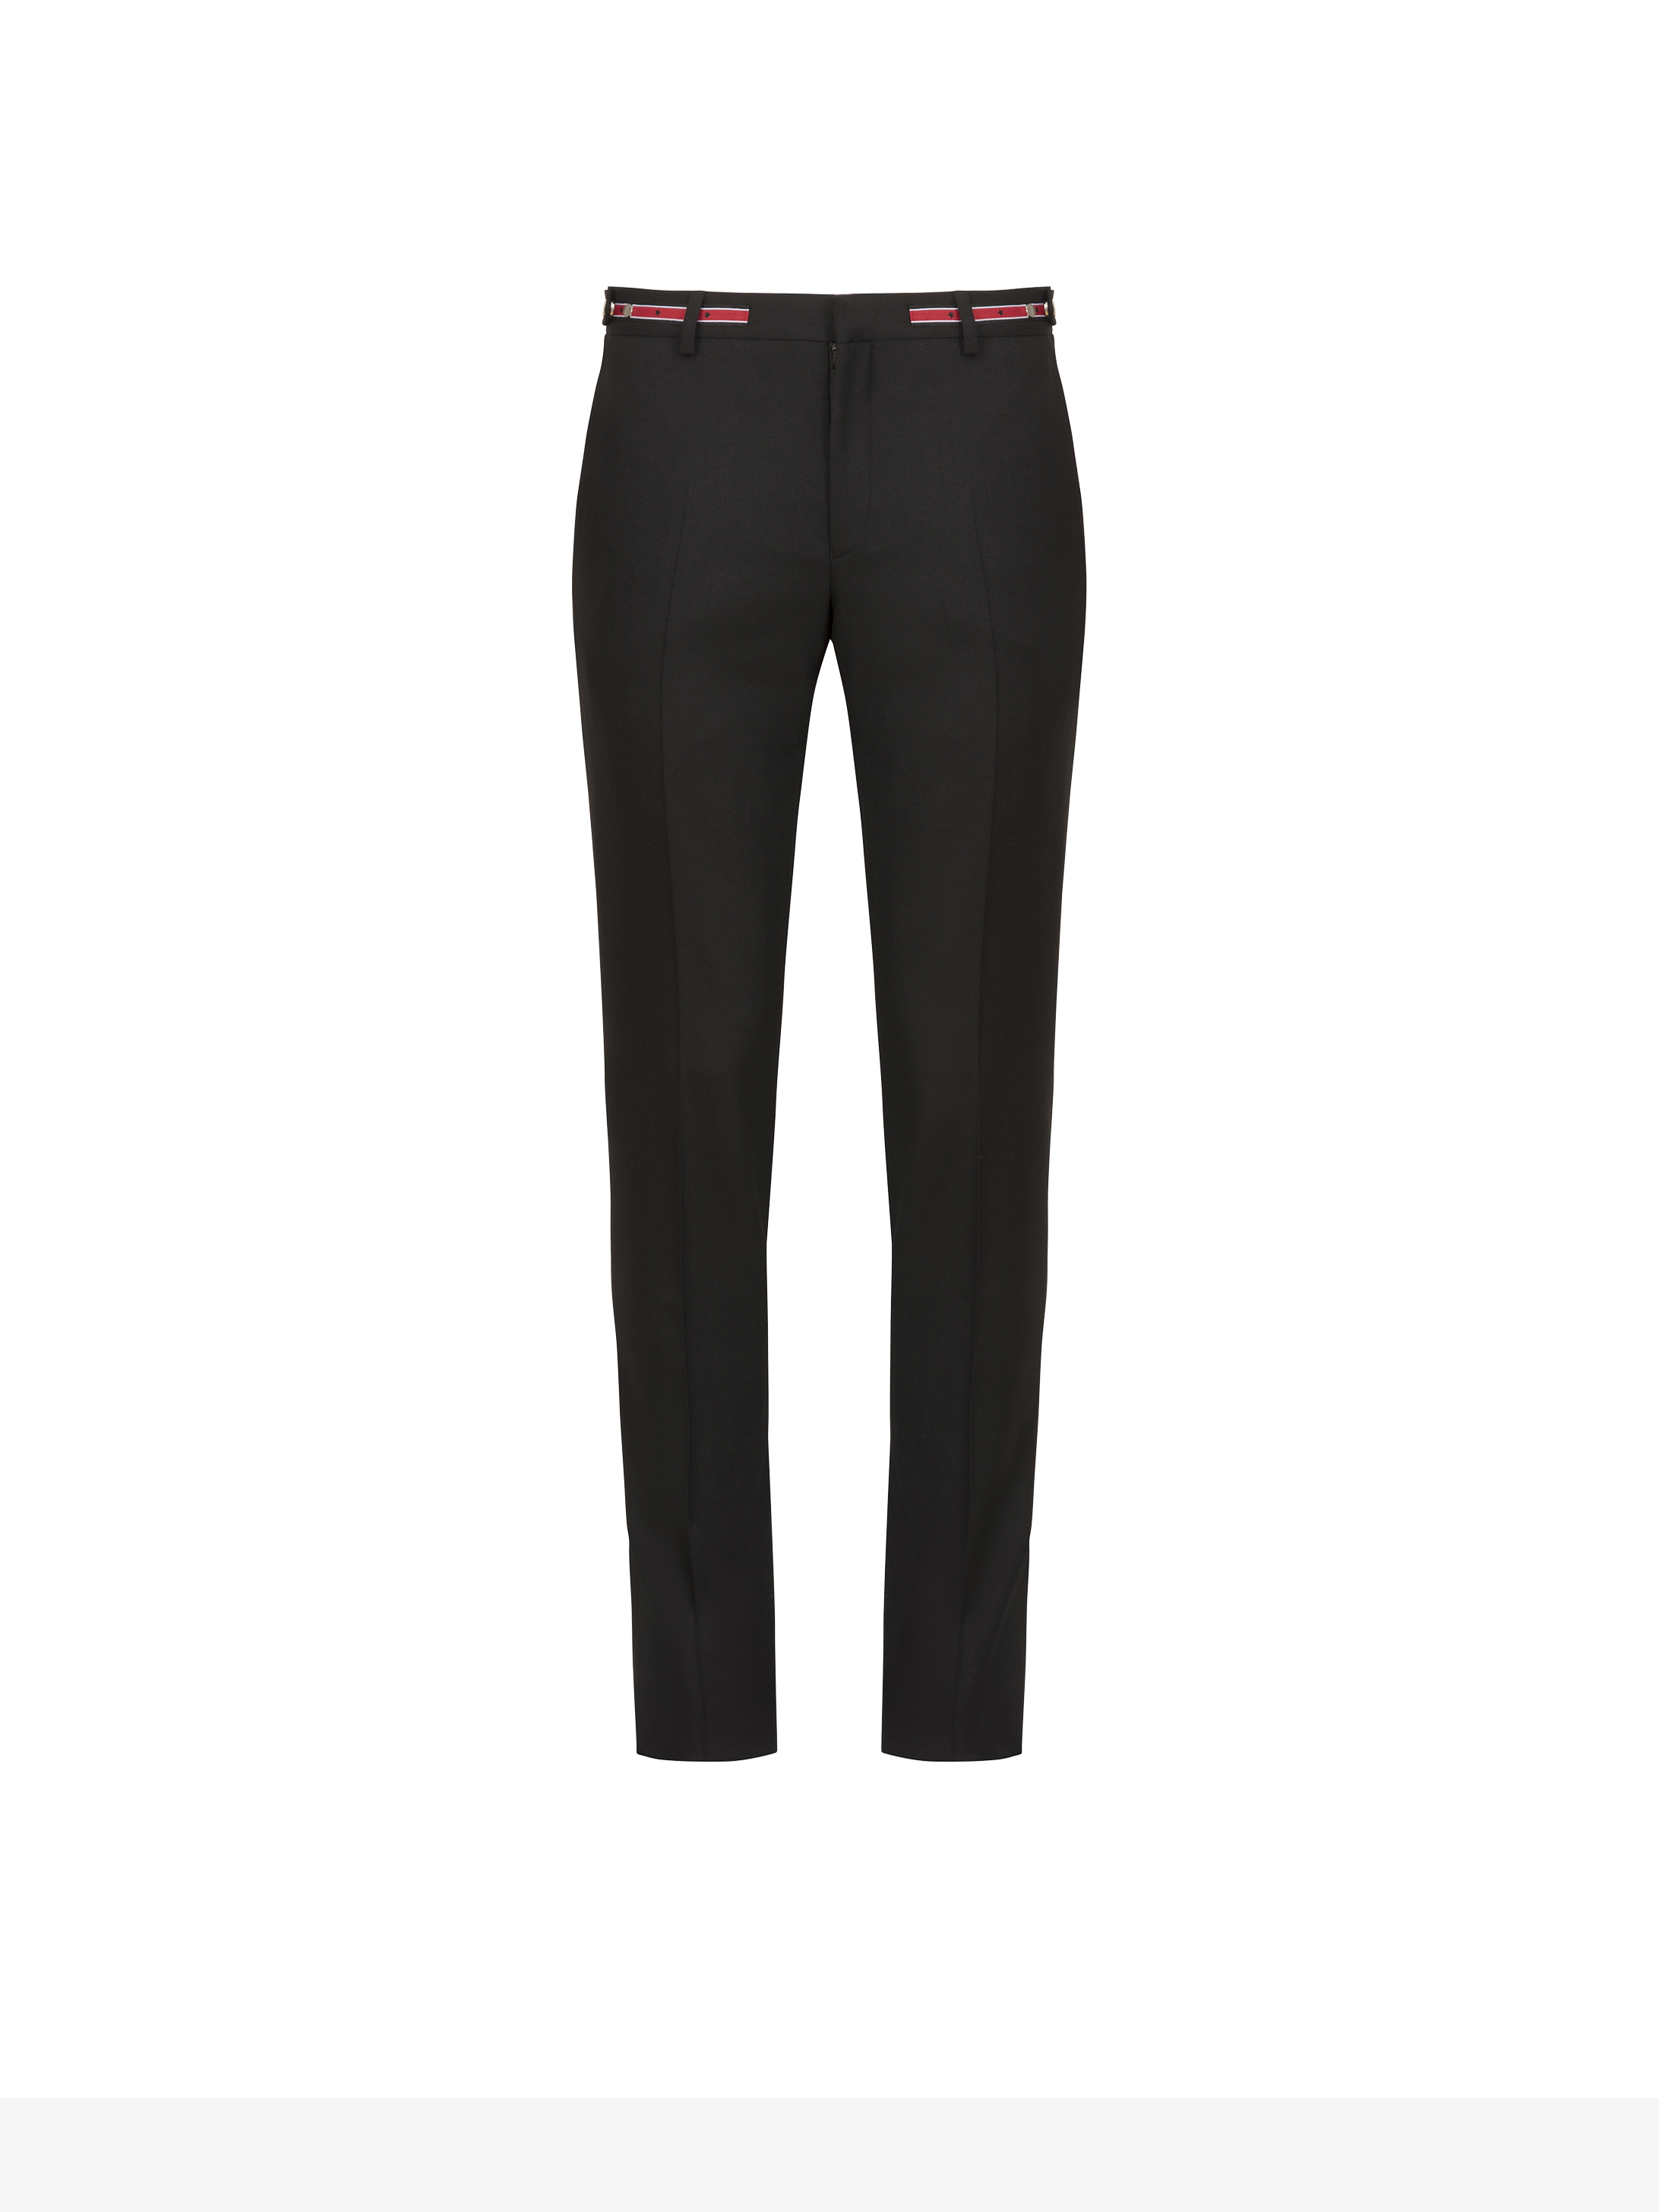 Pantaloni slim con cintura a contrasto